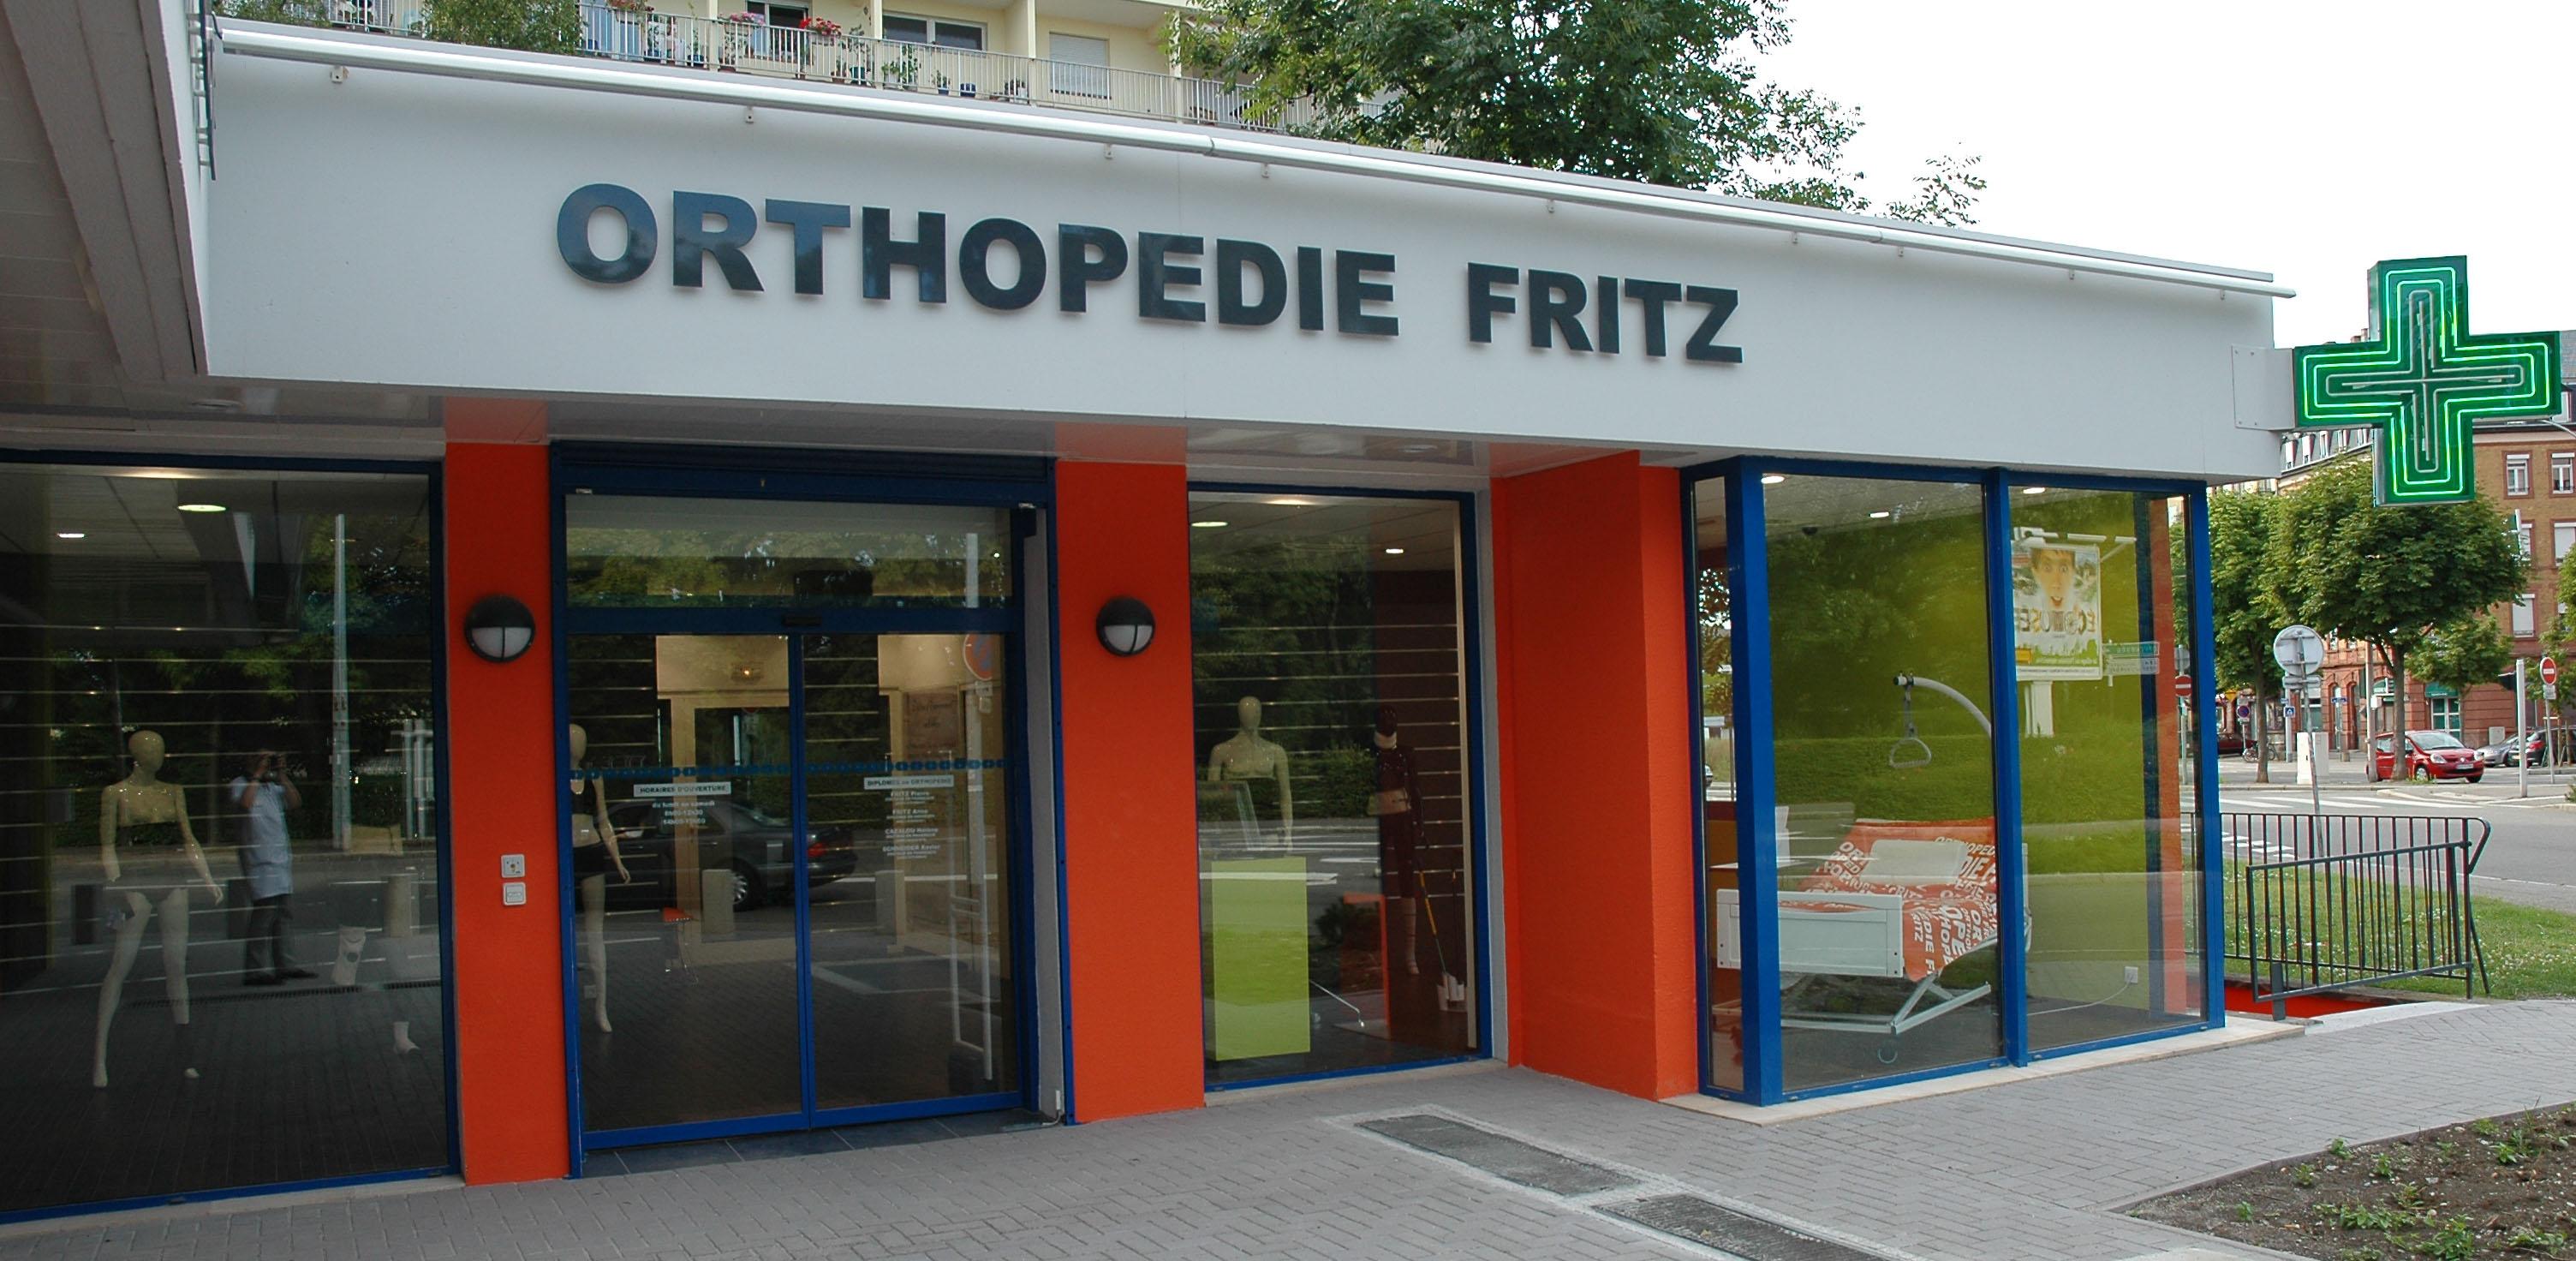 Orthopédie Fritz